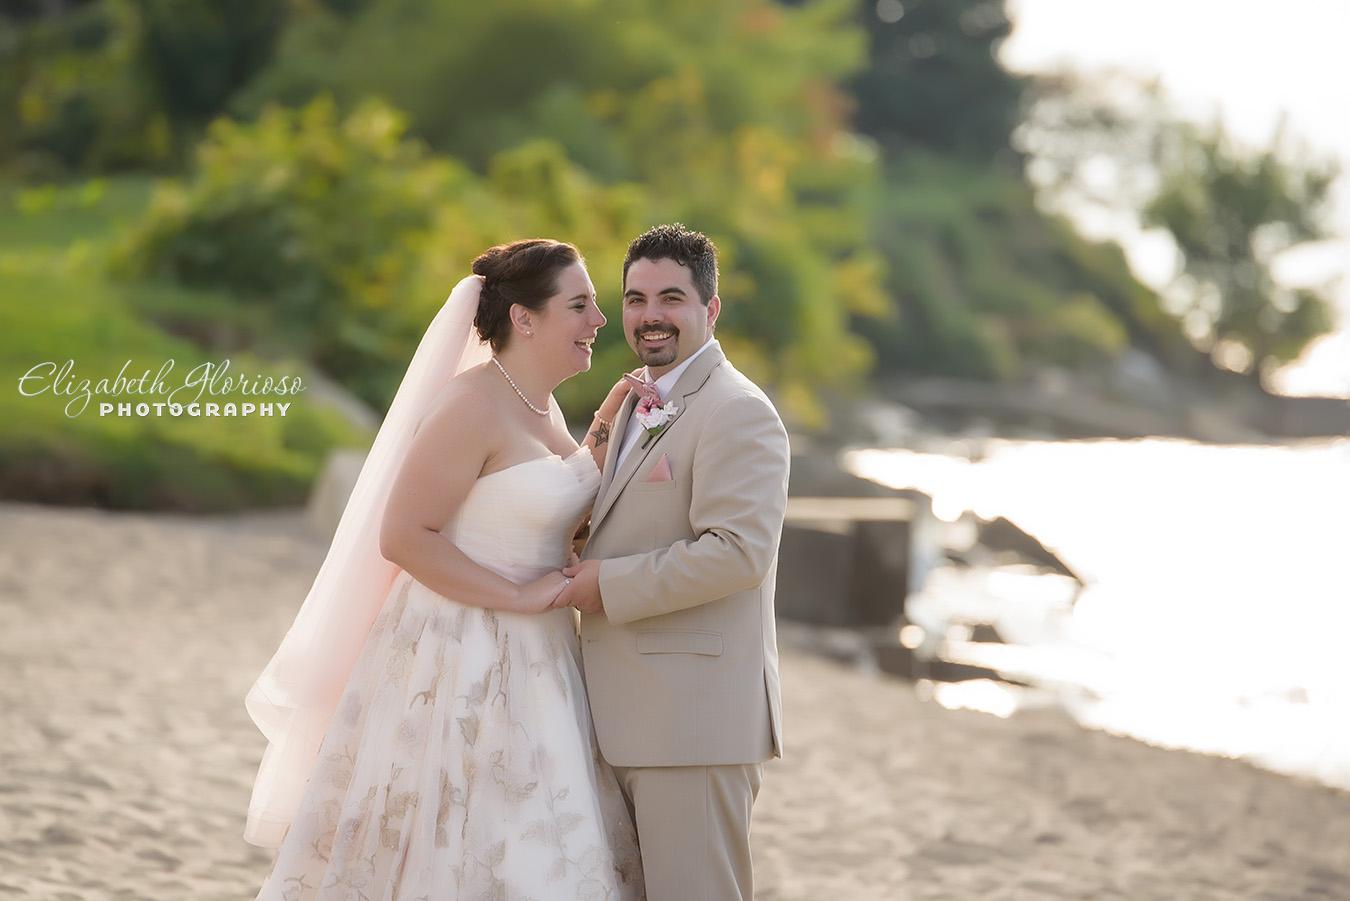 Vermilion_wedding_Glorioso Photography_1035